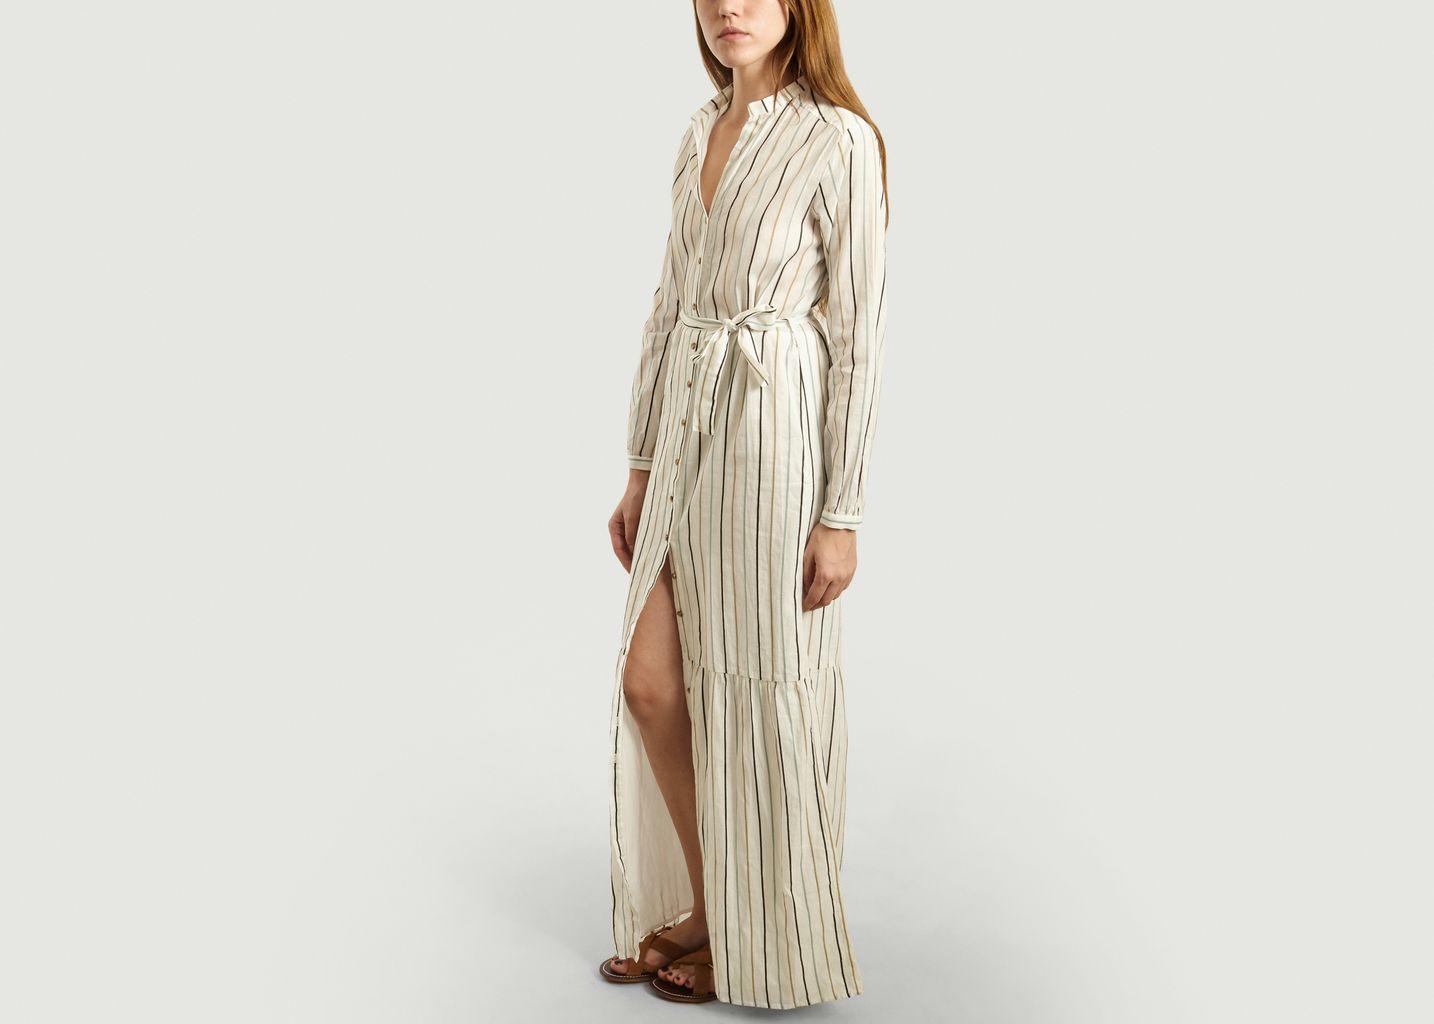 Robe-Chemise Longue Rayée Ofra - Tinsels